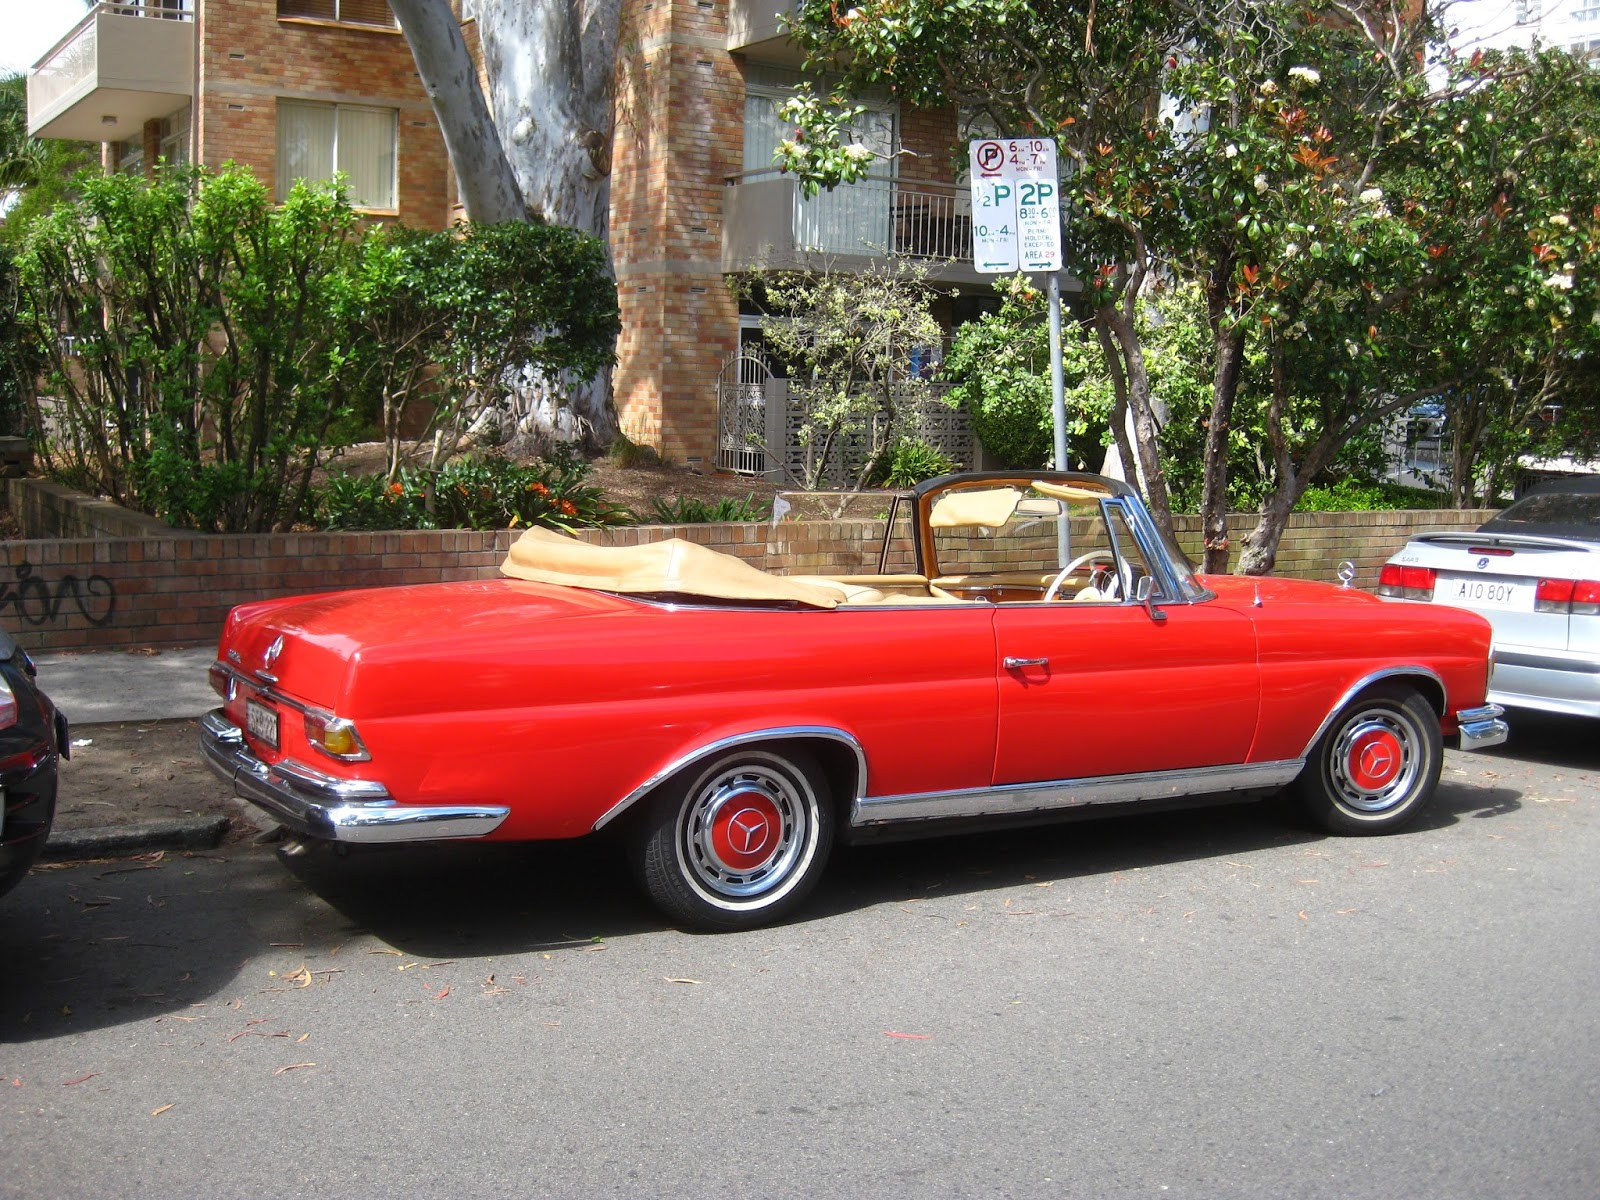 Aussie old parked cars 1964 mercedes benz w111 220 seb for 1964 mercedes benz